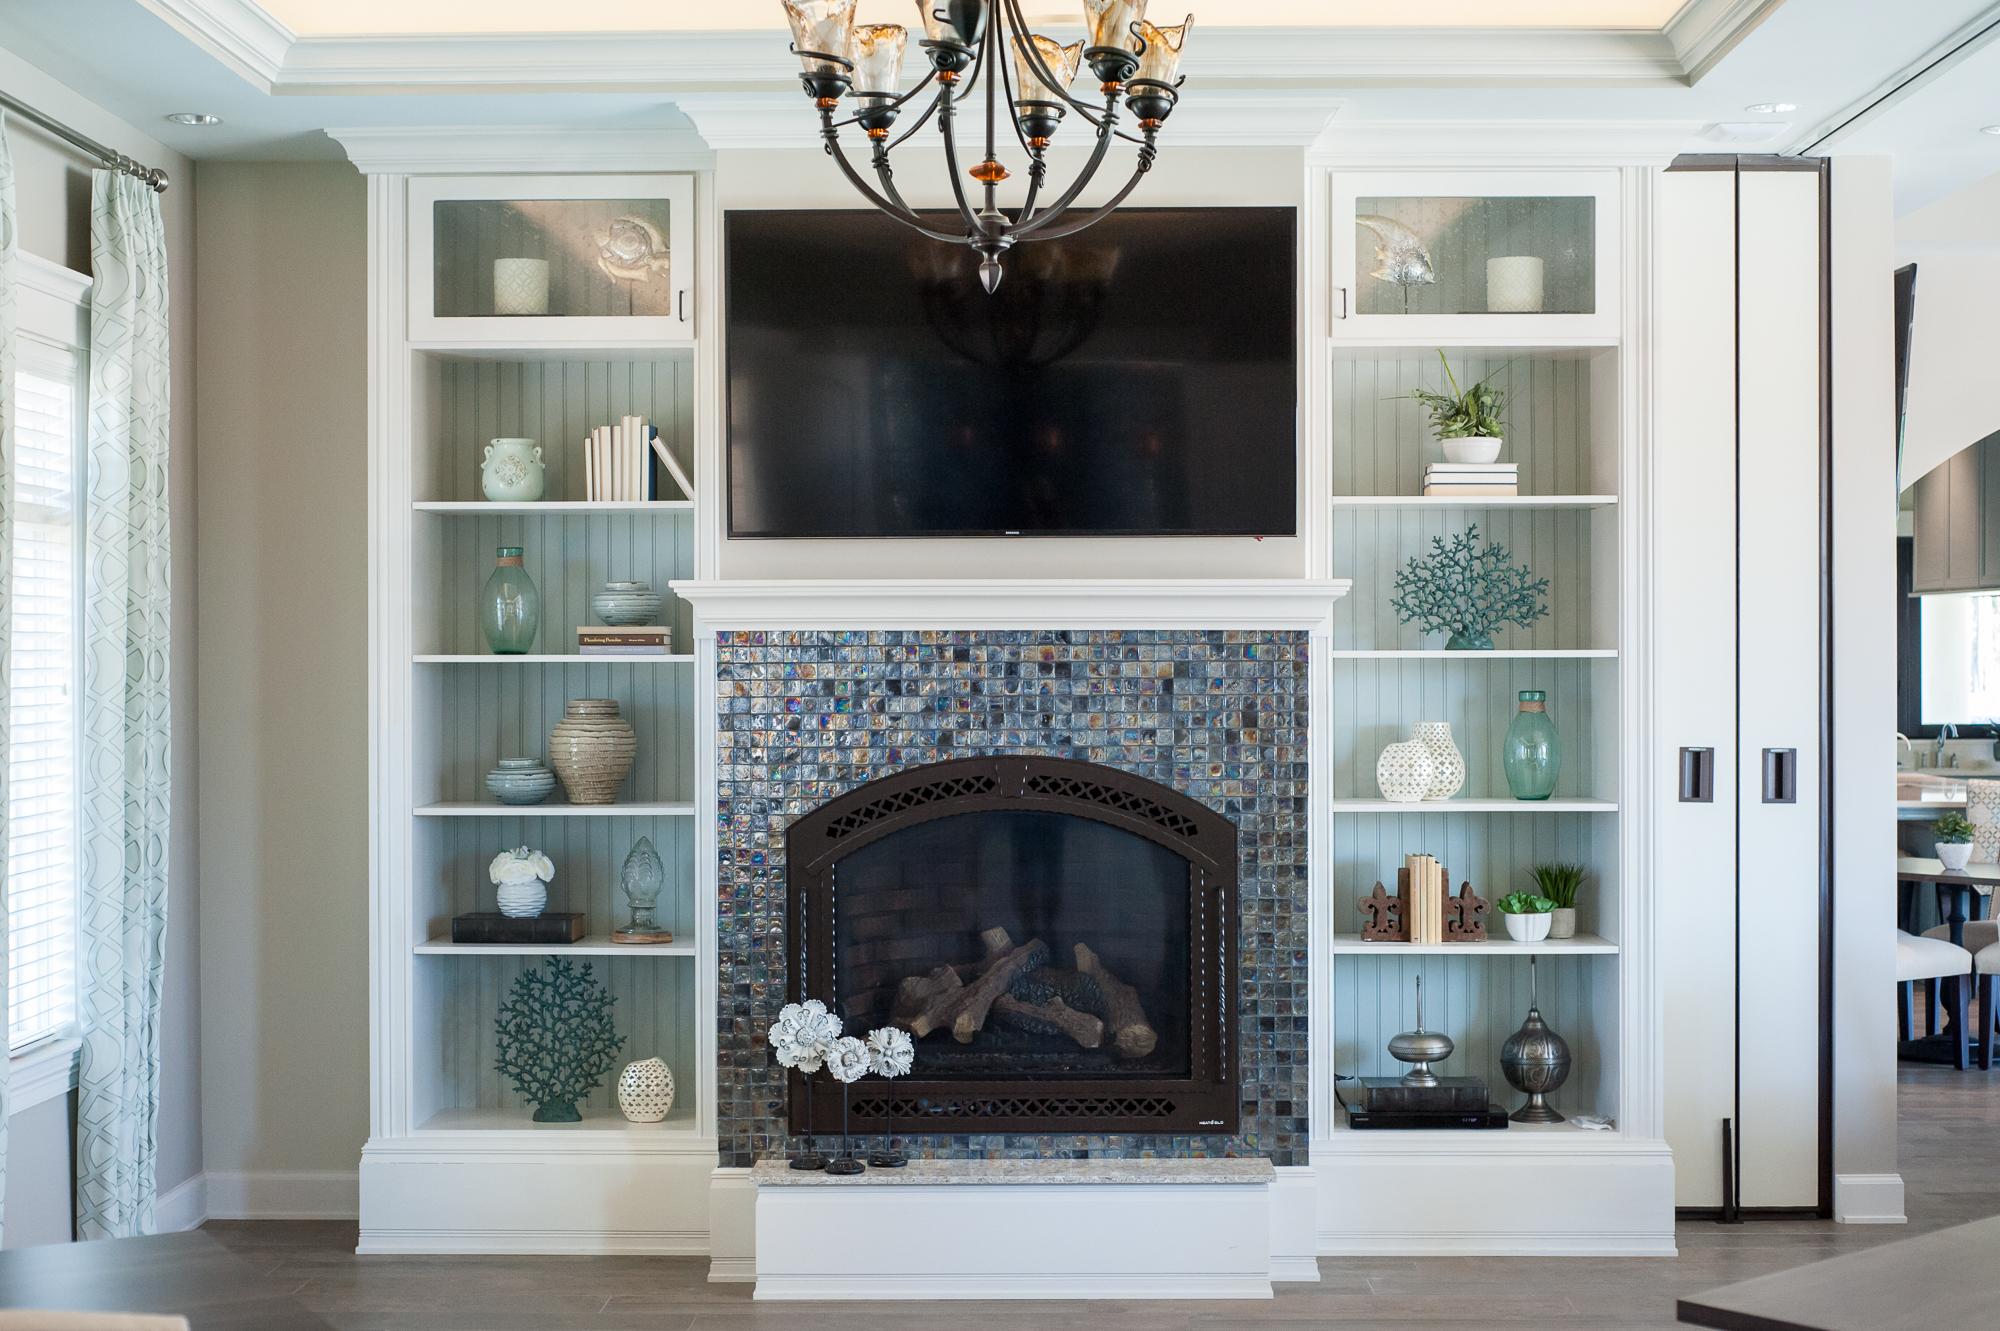 Micamy_Design_Studio_Interior_Design_Artisan_Lakes_Clubhouse_Serene_Coastal_Glass_Mosaic_Tile_Backsplash_Fireplace_SherwinWilliams_Crossville_Blue_ (3).jpg